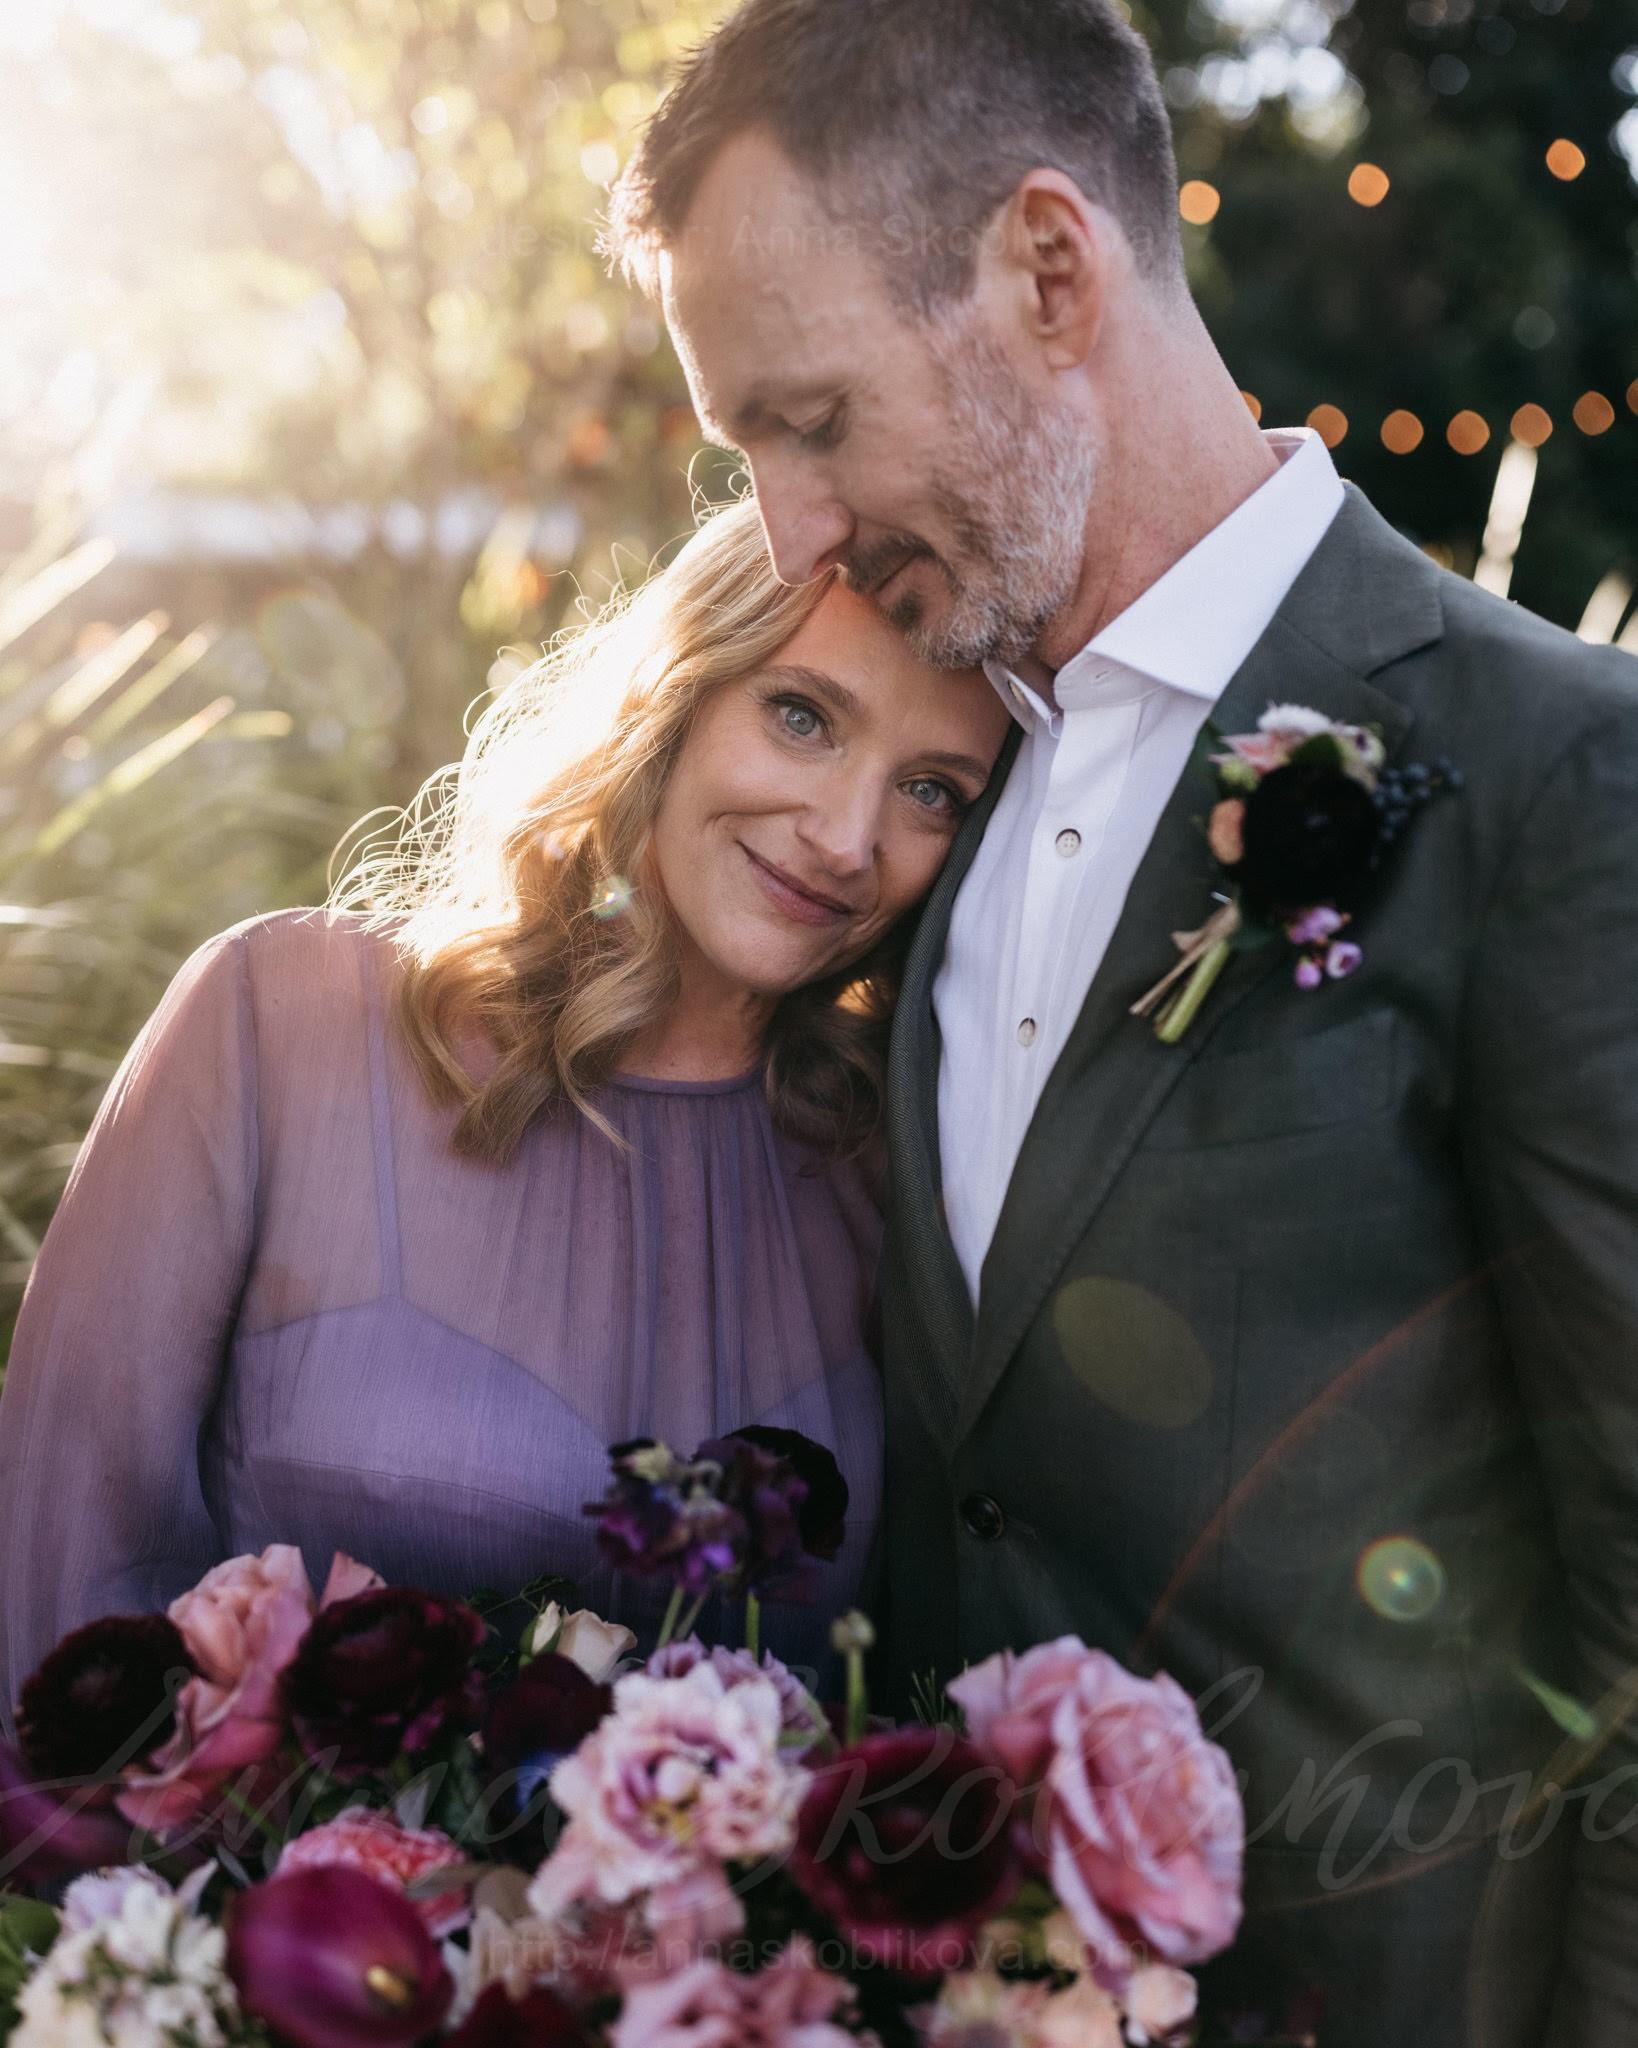 Violet wedding dress in vintage style \ 0127   Photo 1